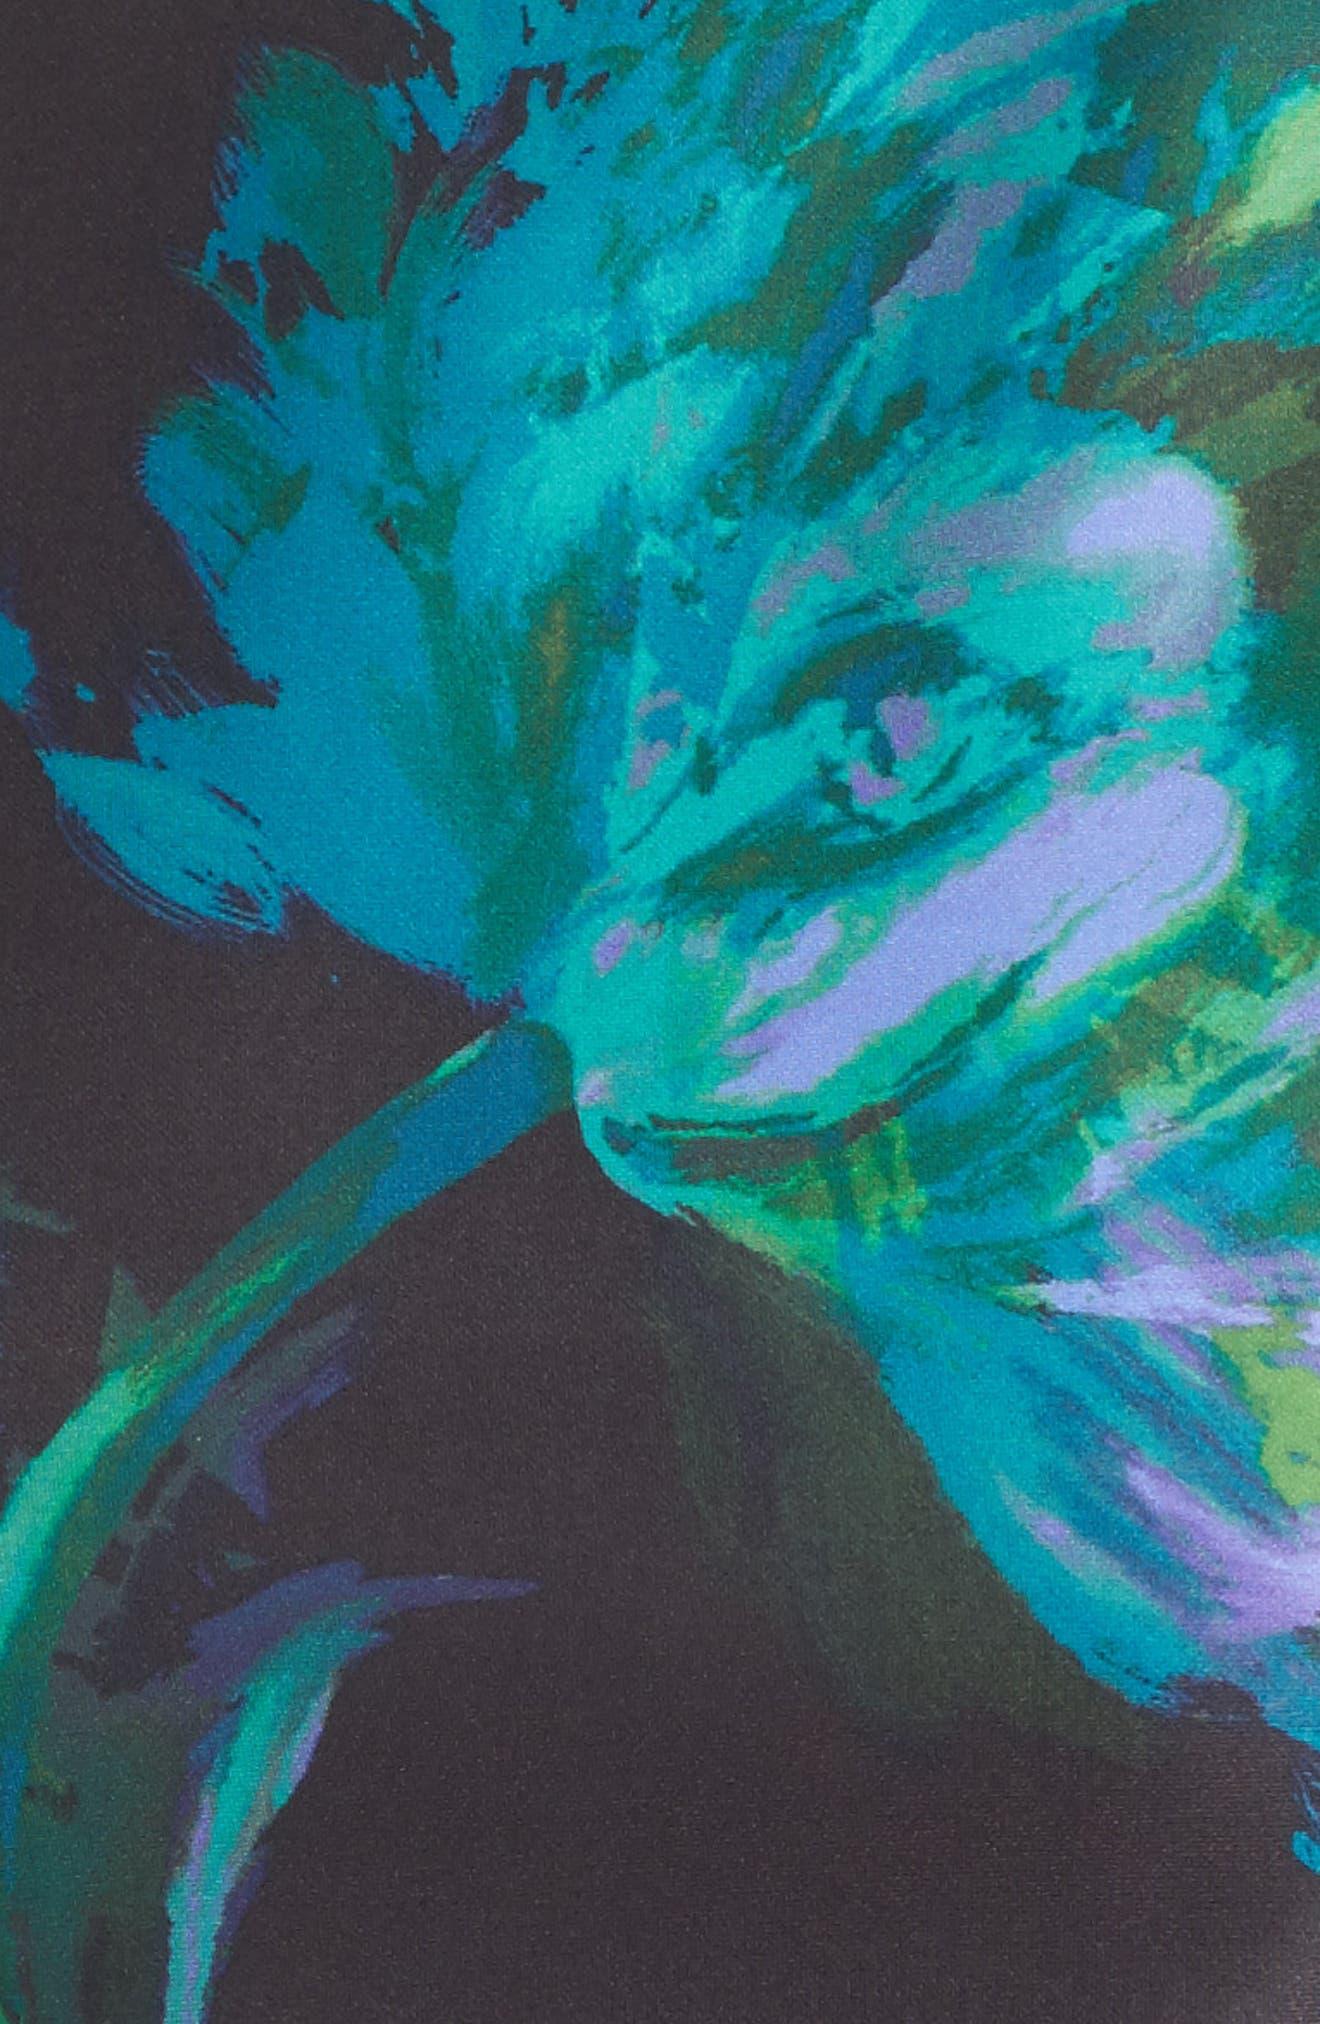 Floral Print Shift Dress,                             Alternate thumbnail 5, color,                             440